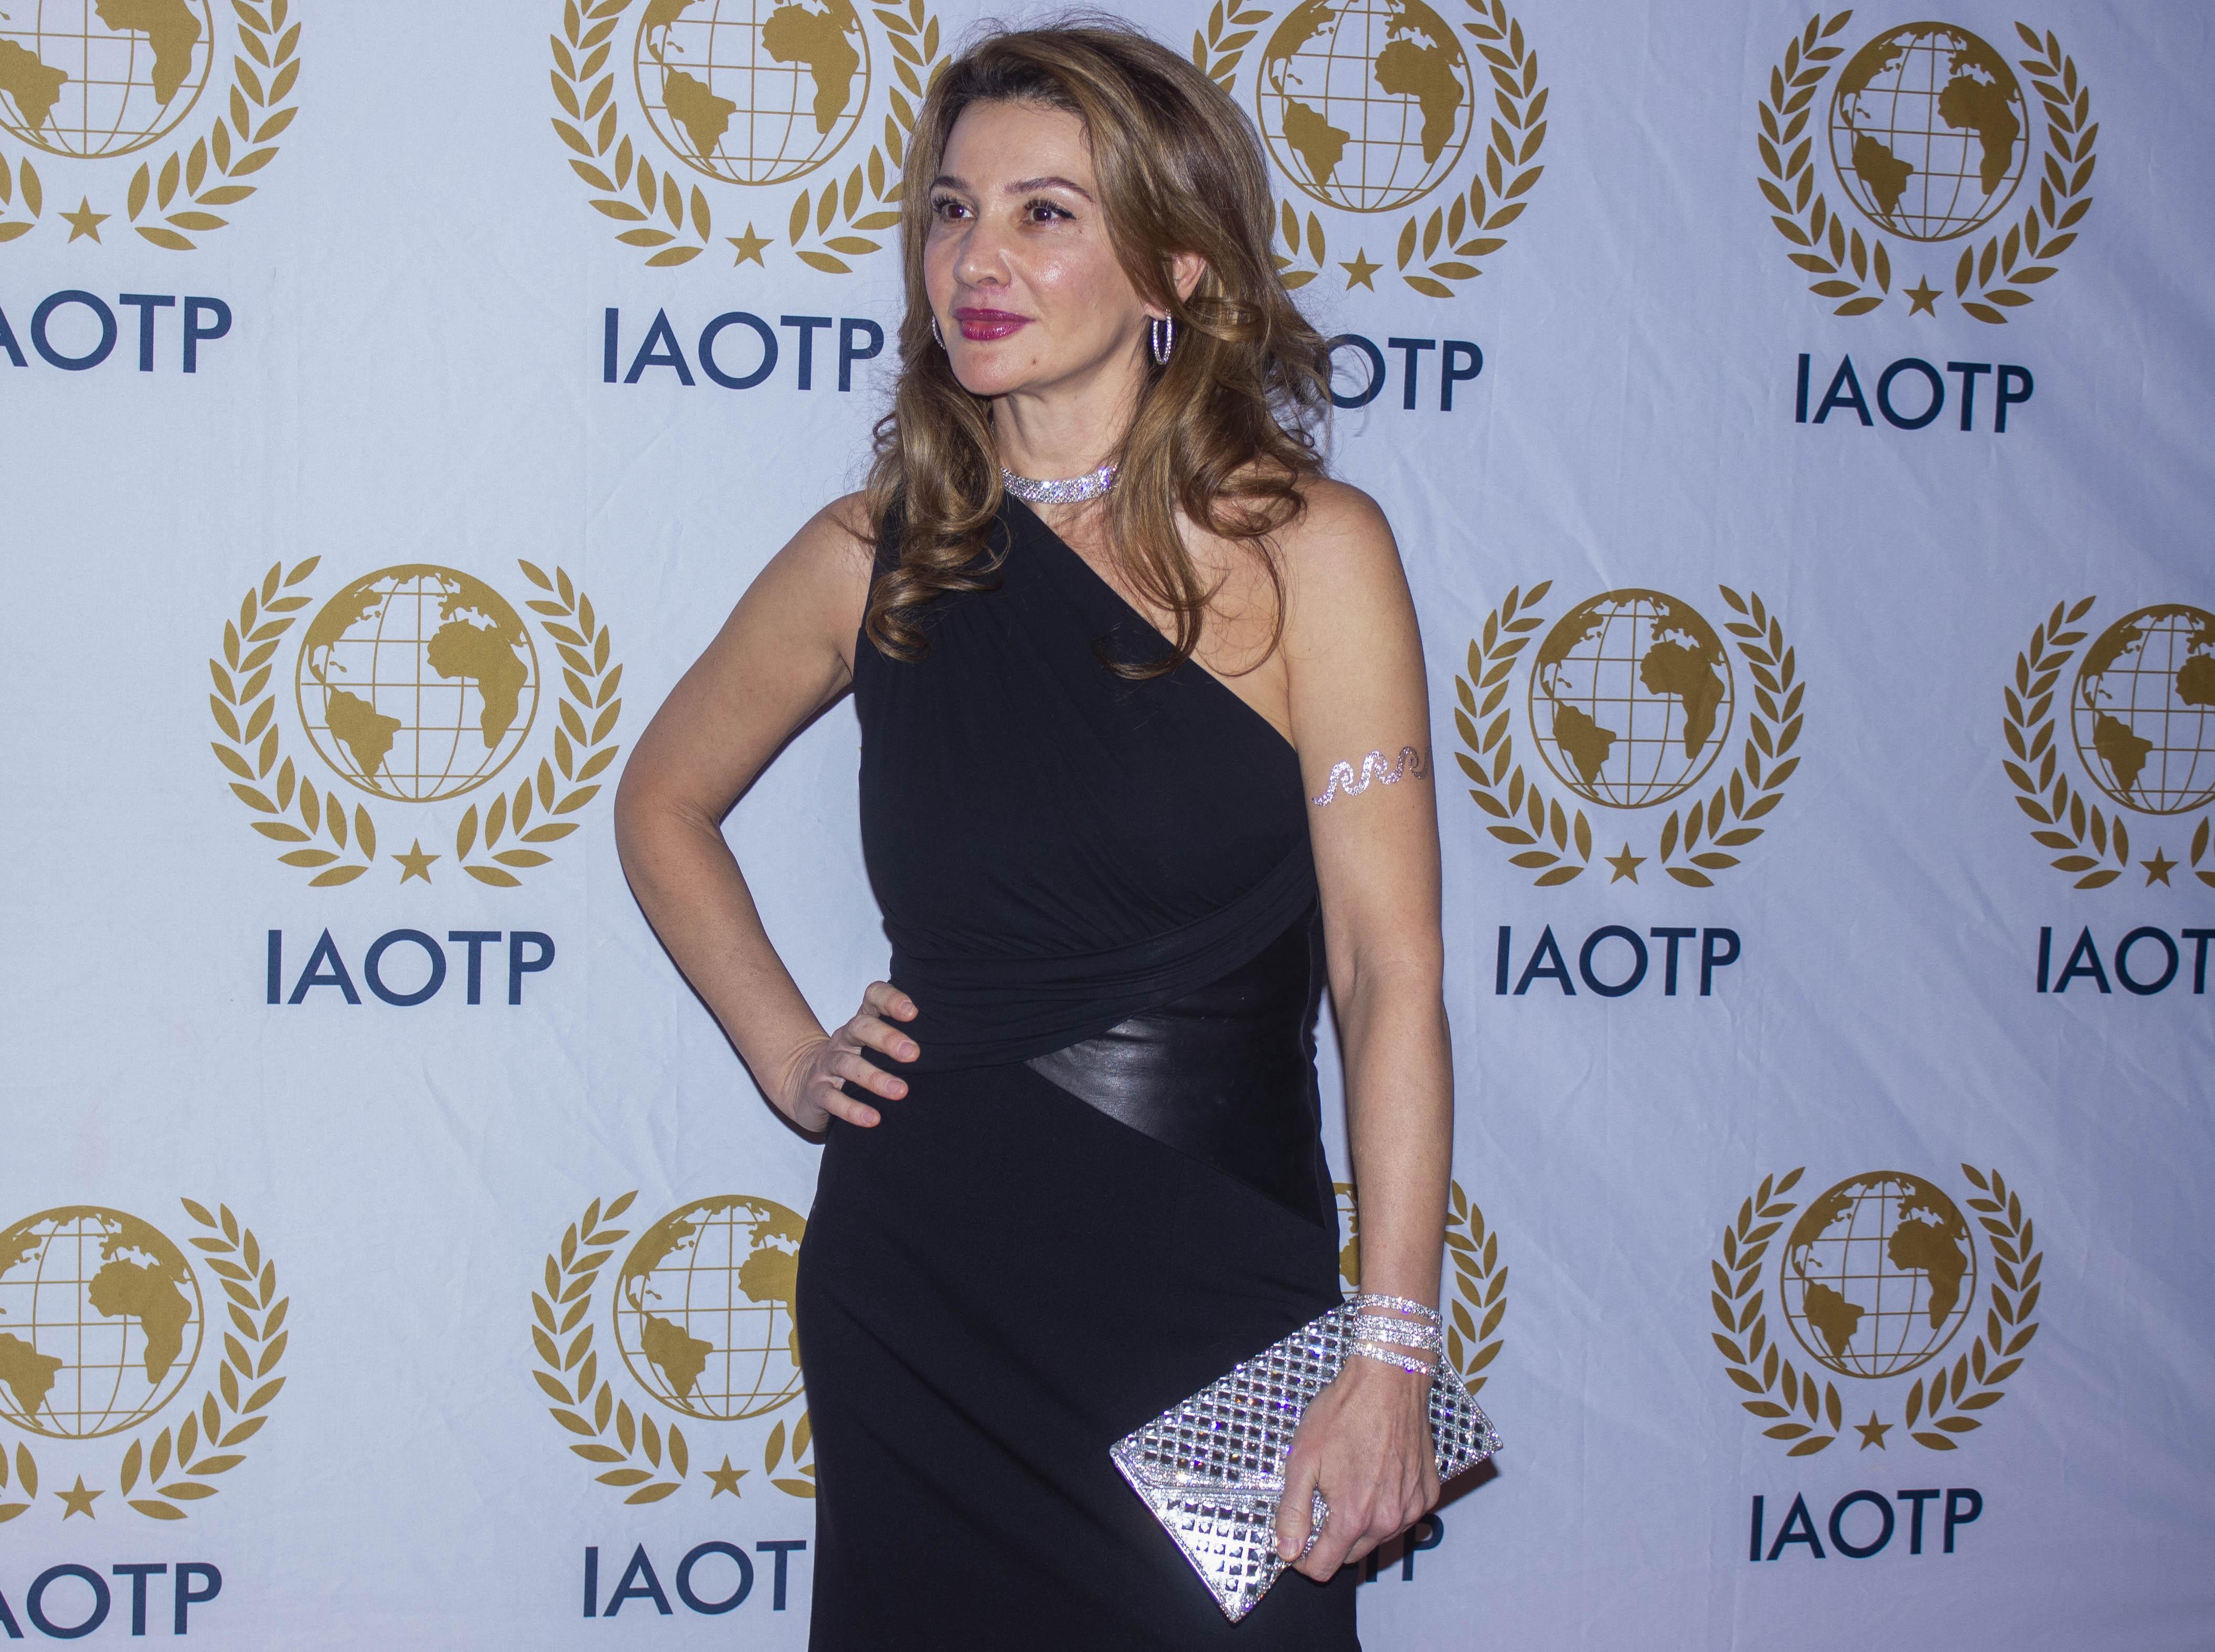 AMC Celebrates the IAOTP Awards at the Plaza! 4